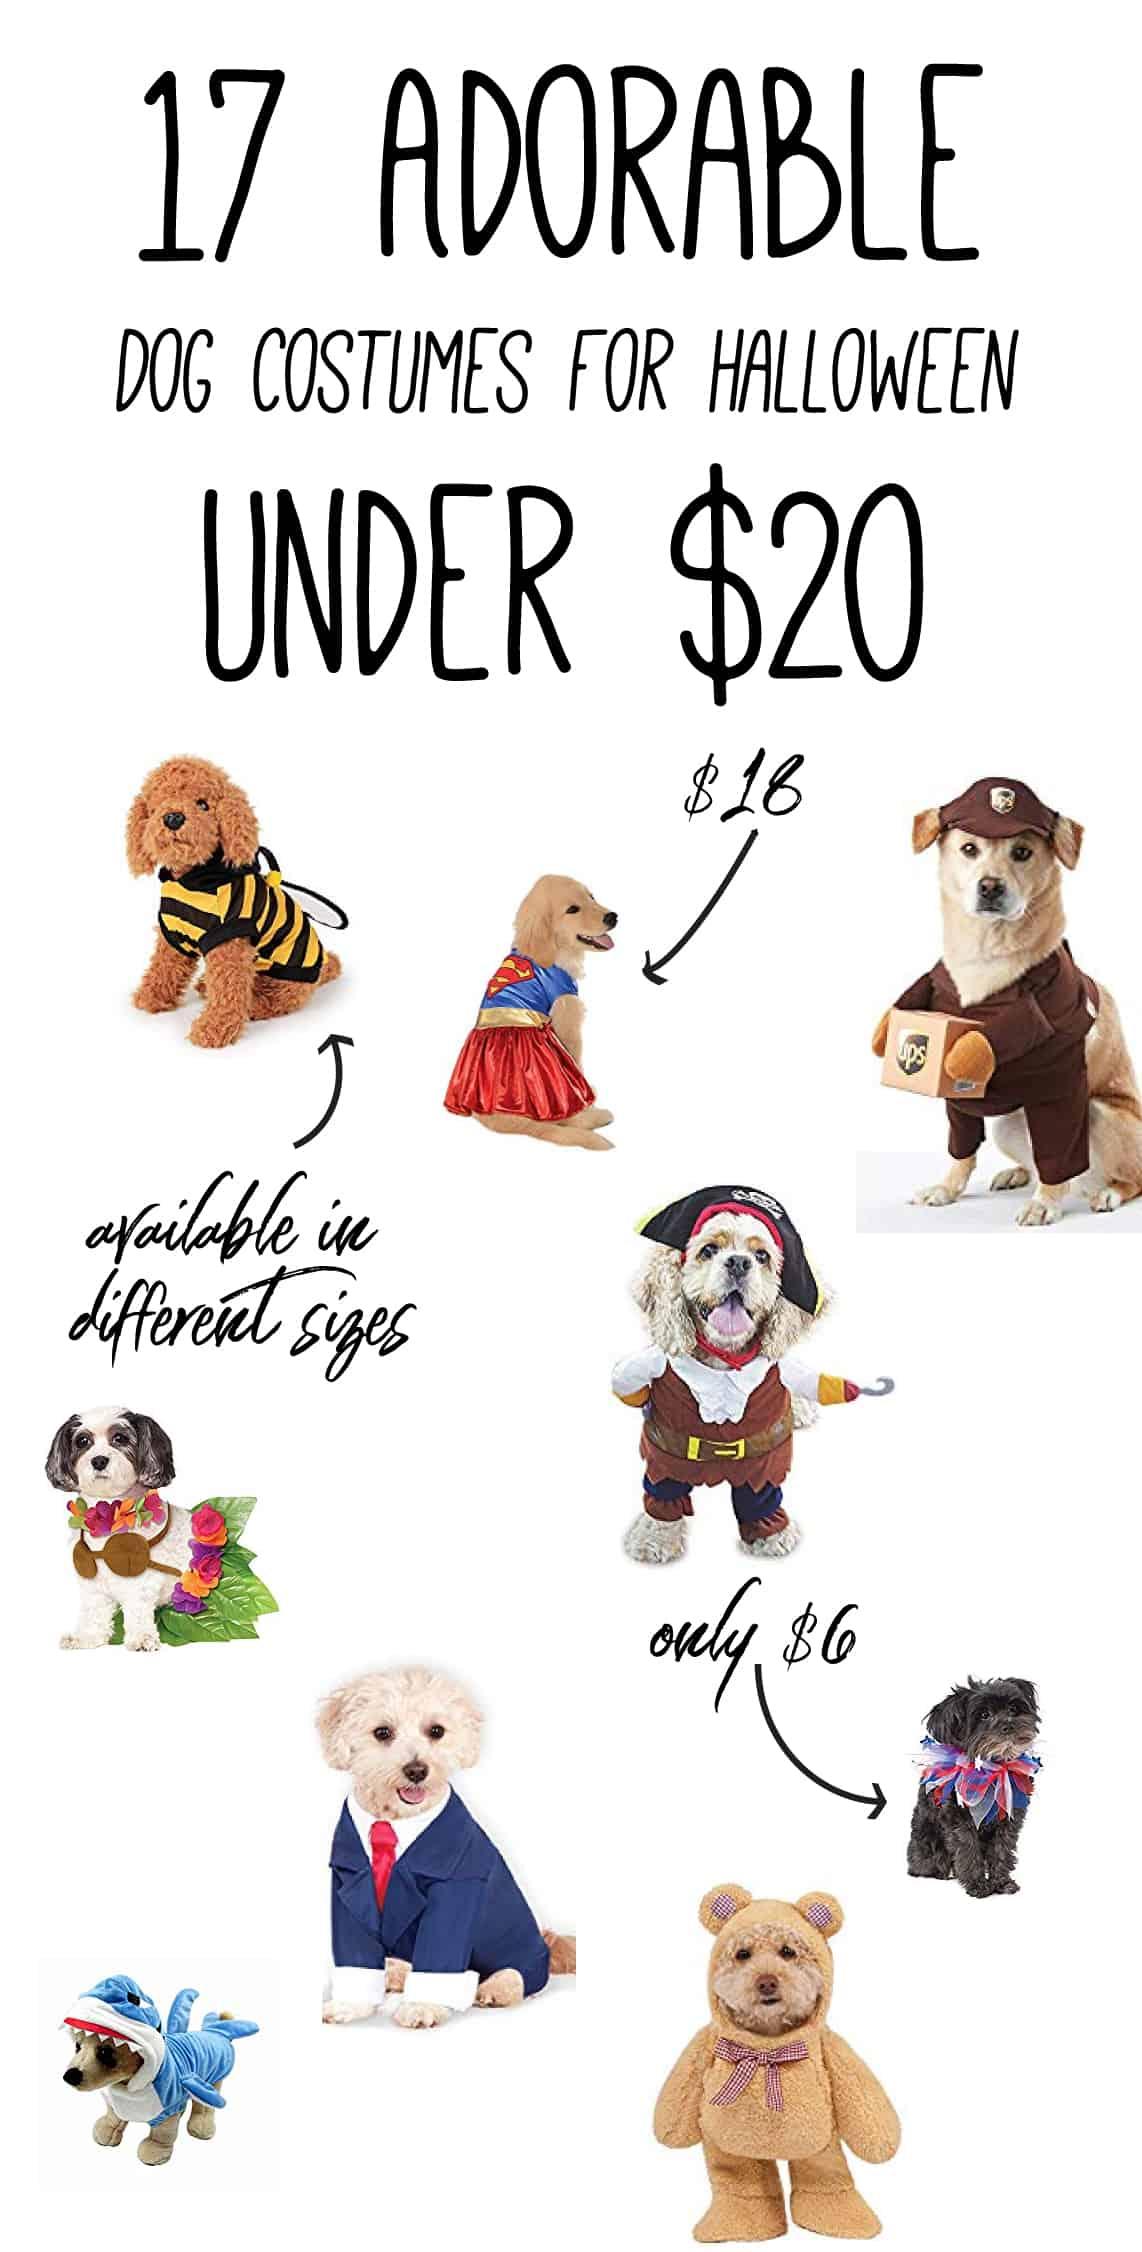 Dog halloween costume infographic